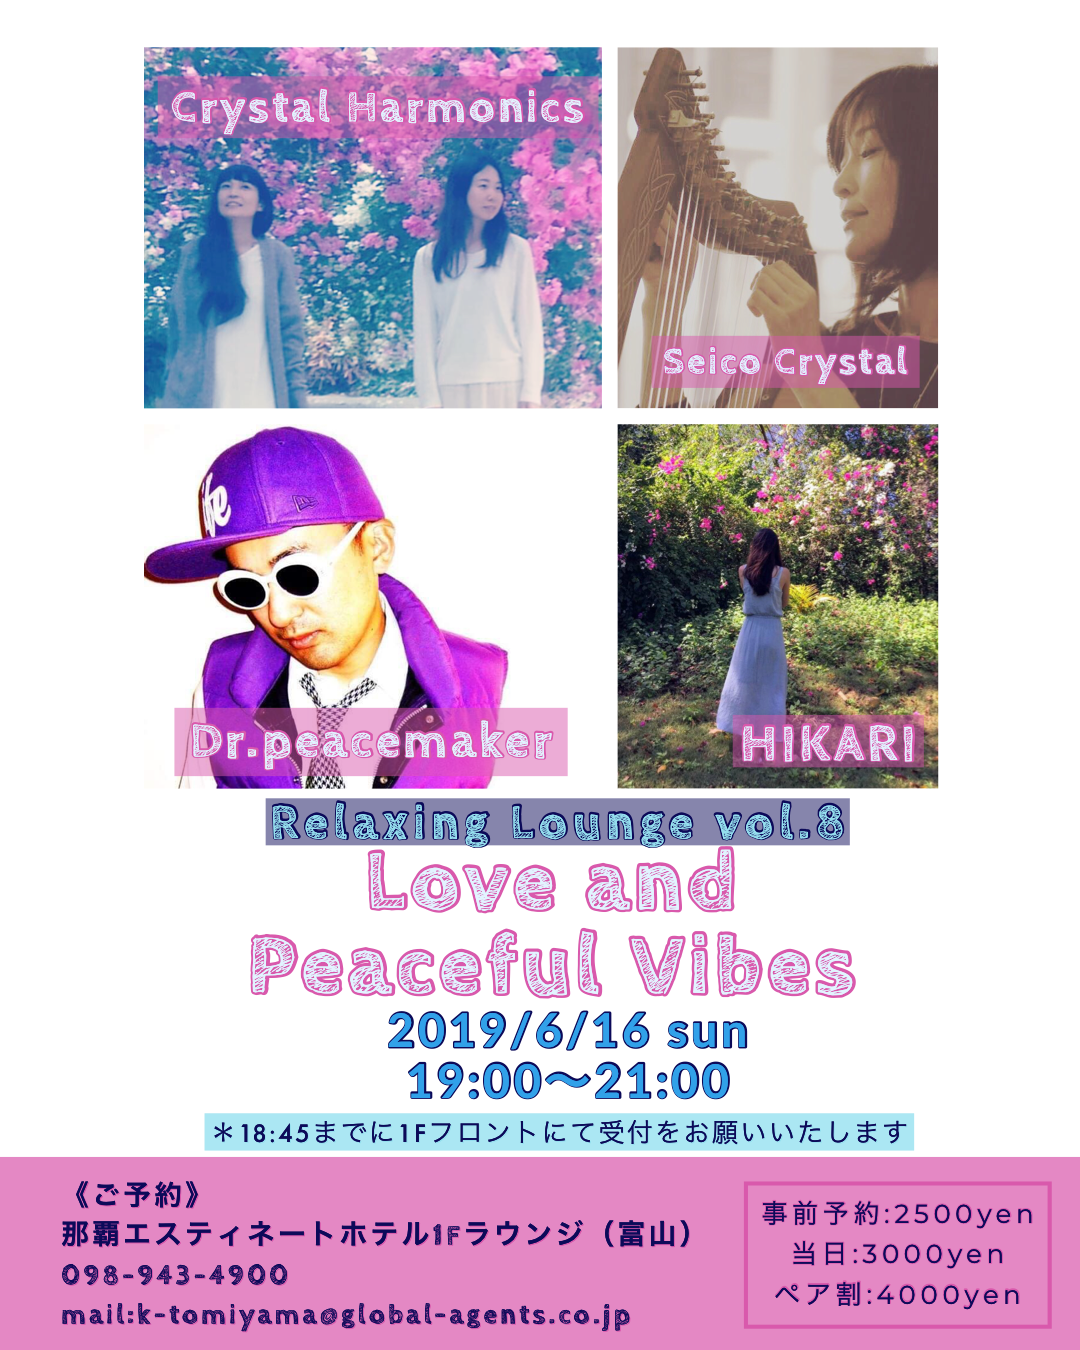 2019/6/16sun 『Love and Peaceful Vibe